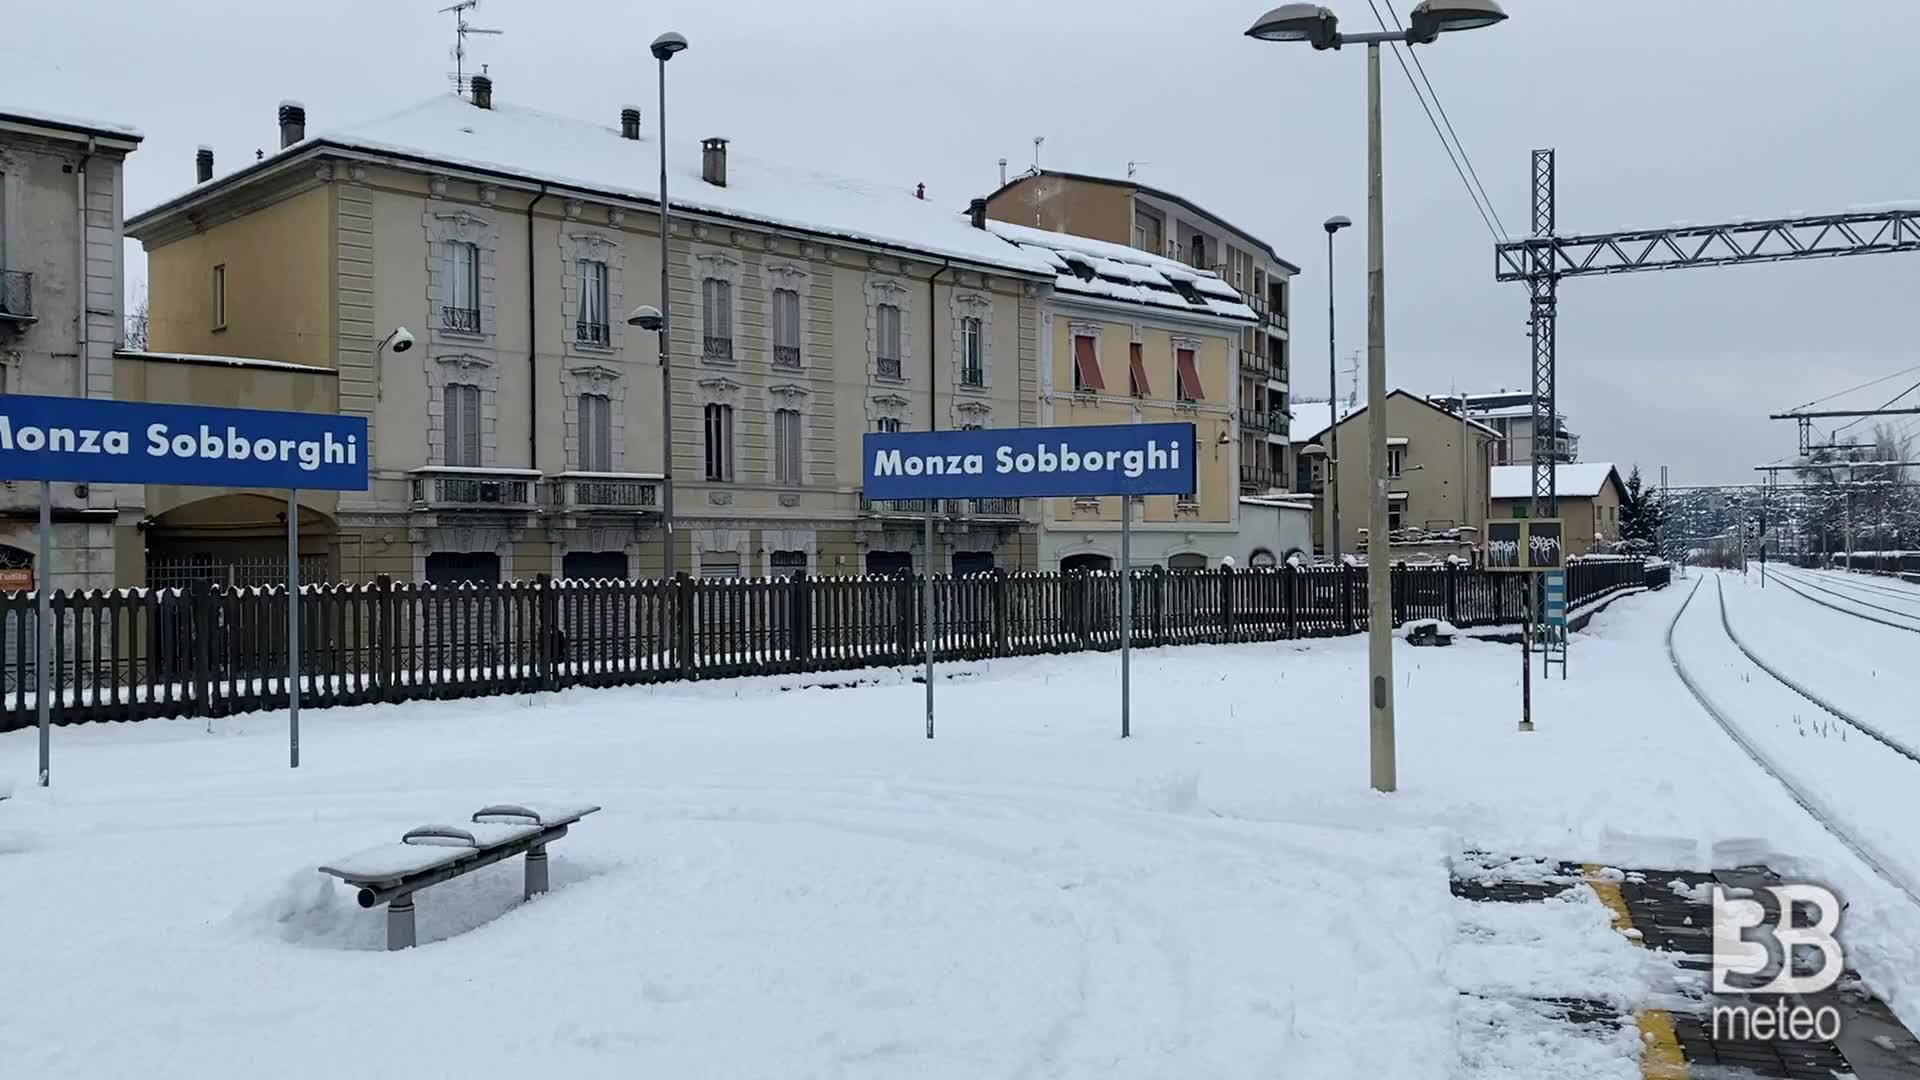 Nevicata a Monza: stazione imbiancata